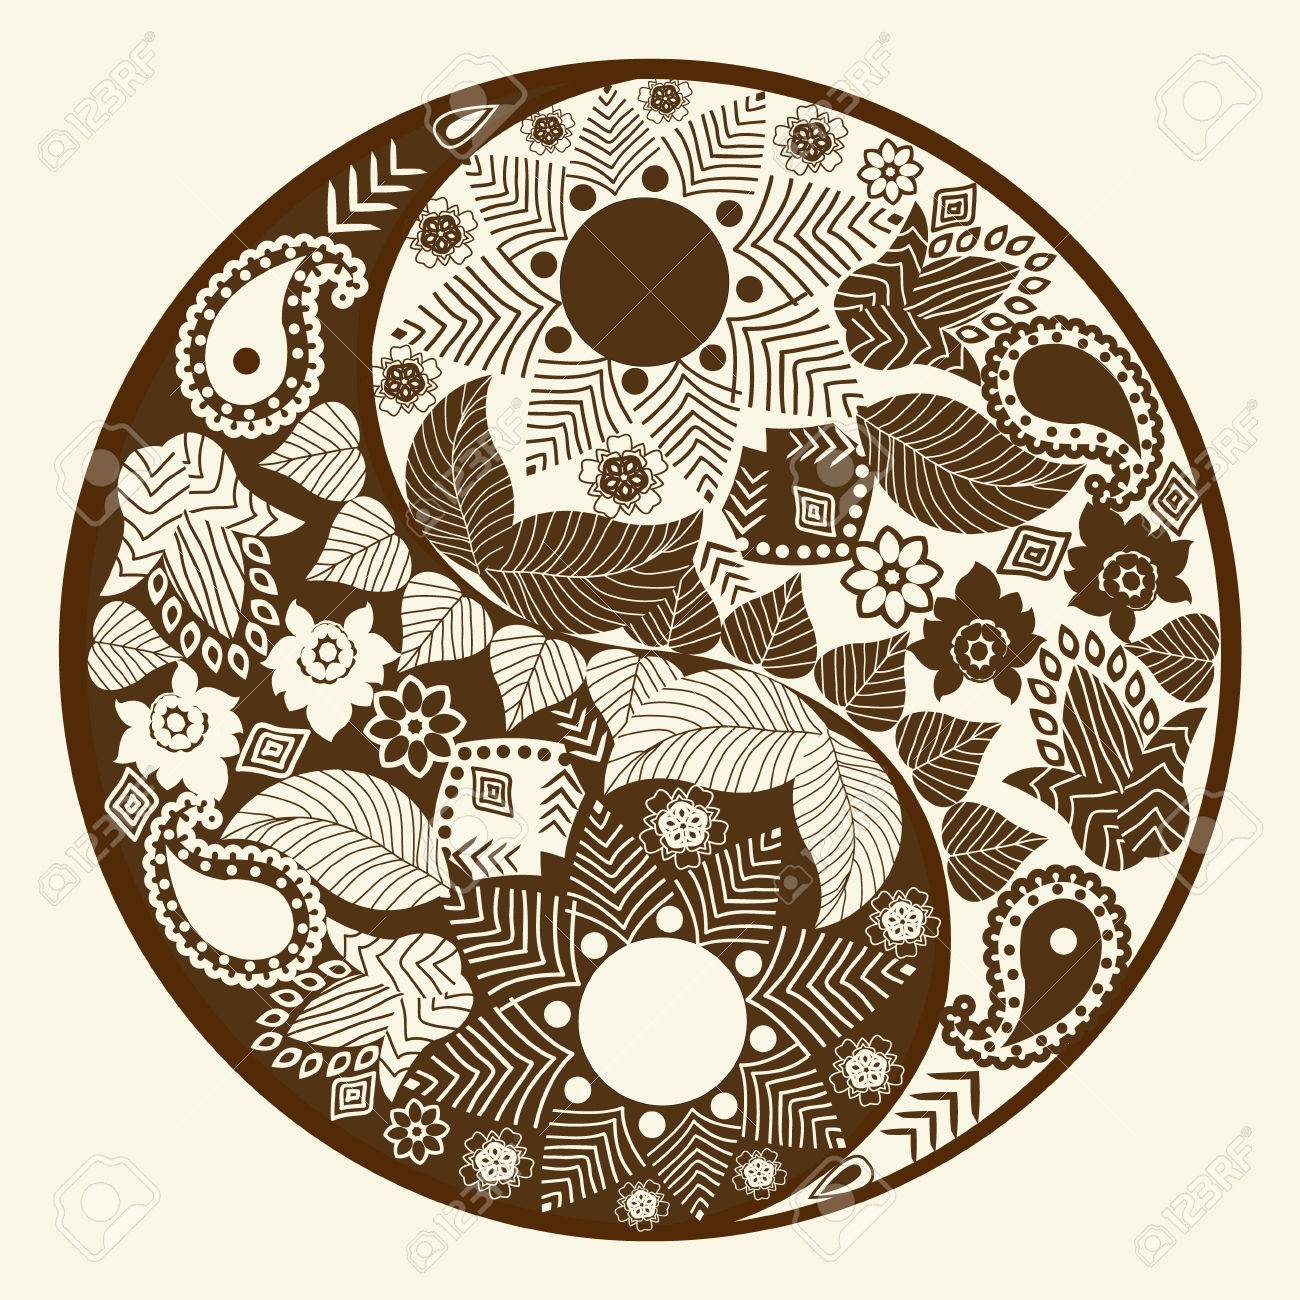 1300x1300 Yin Yang Symbol, Asian Decoration Element Pattern On White